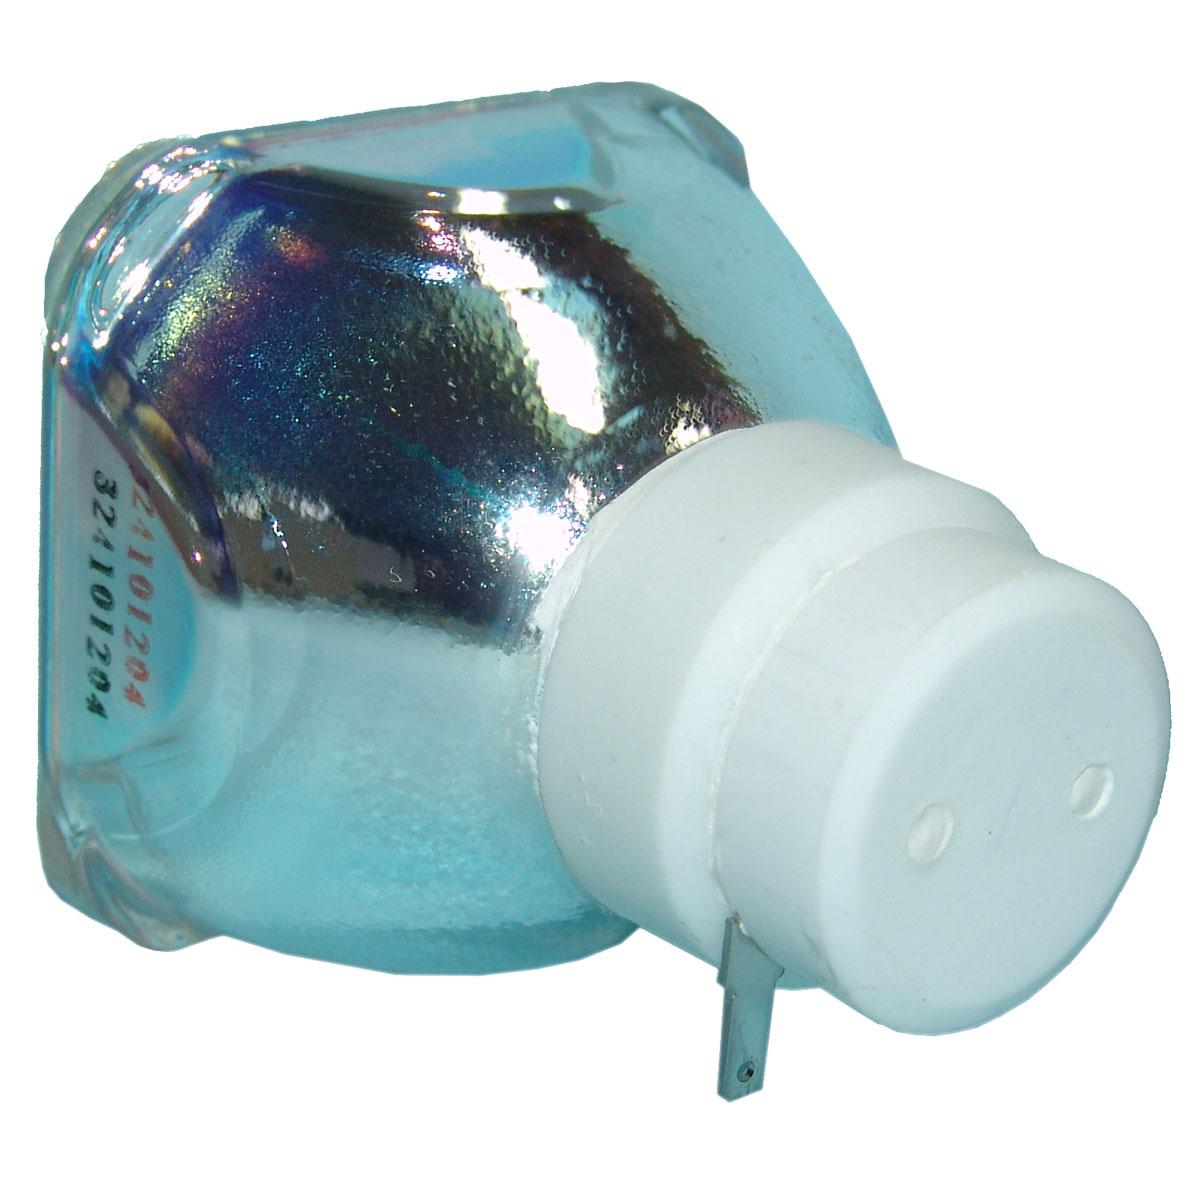 Lutema Platinum for Christie 003-120730-01 Projector Lamp with Housing (Original Philips Bulb Inside) - image 1 de 5